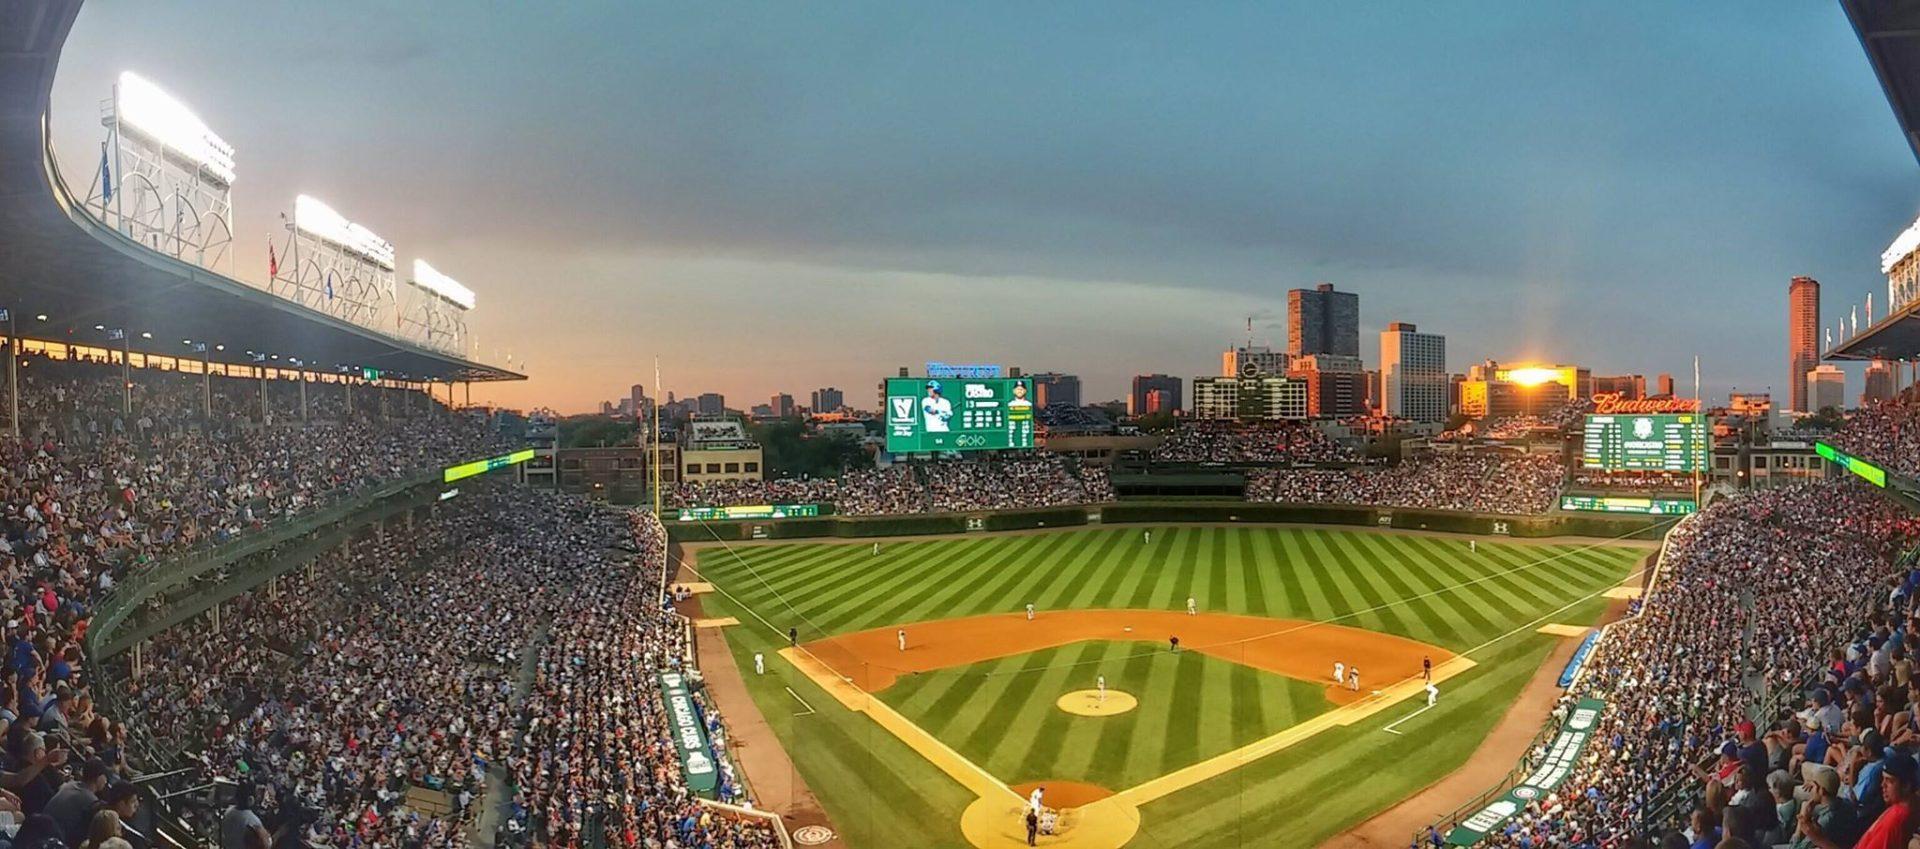 Chicago Cubs Headquarters